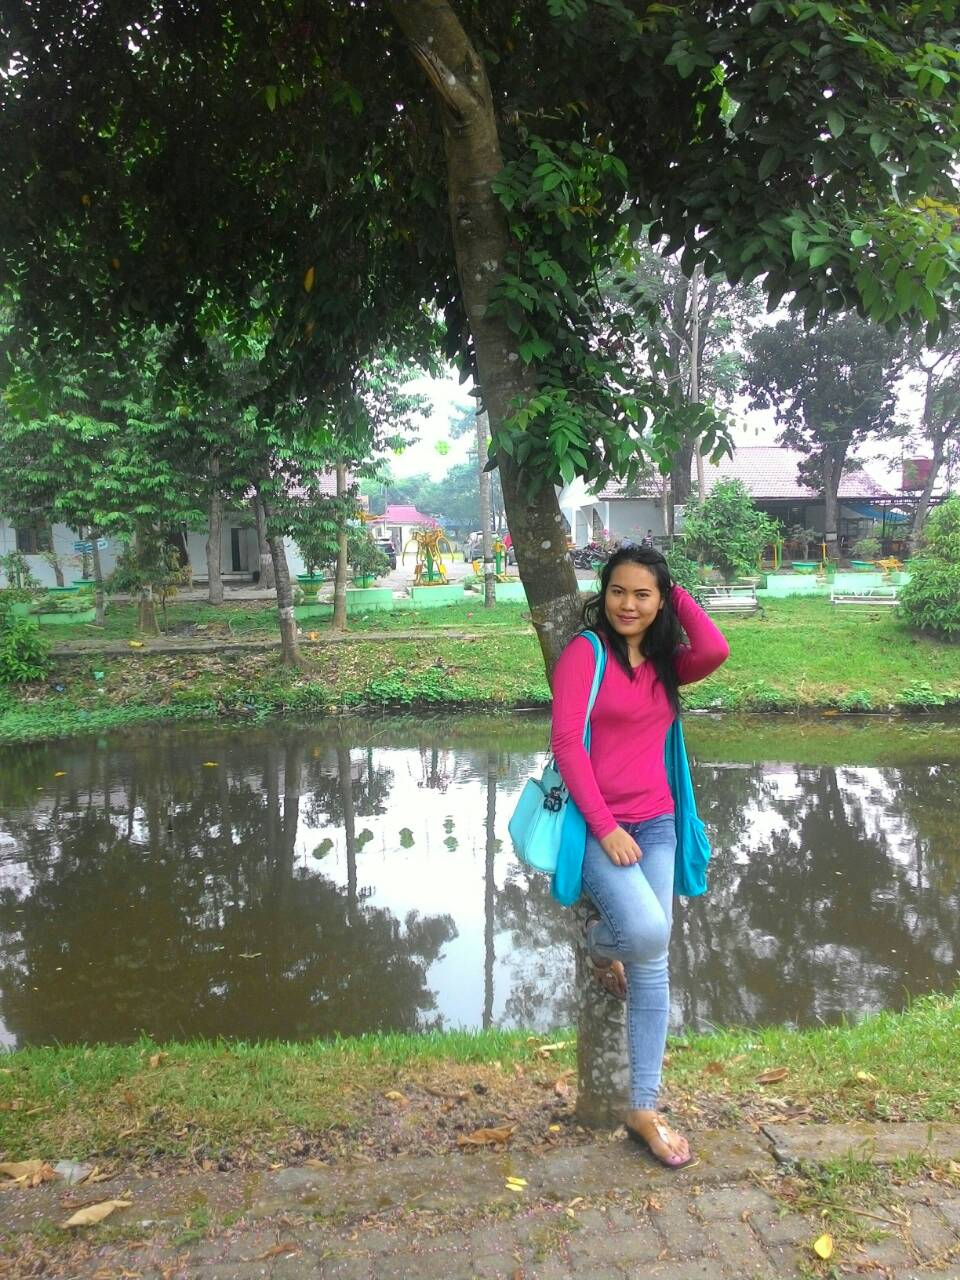 Wisata Kemanaaja Taman Cadika Medan Johor Sumatera Utara Pramuka Kota